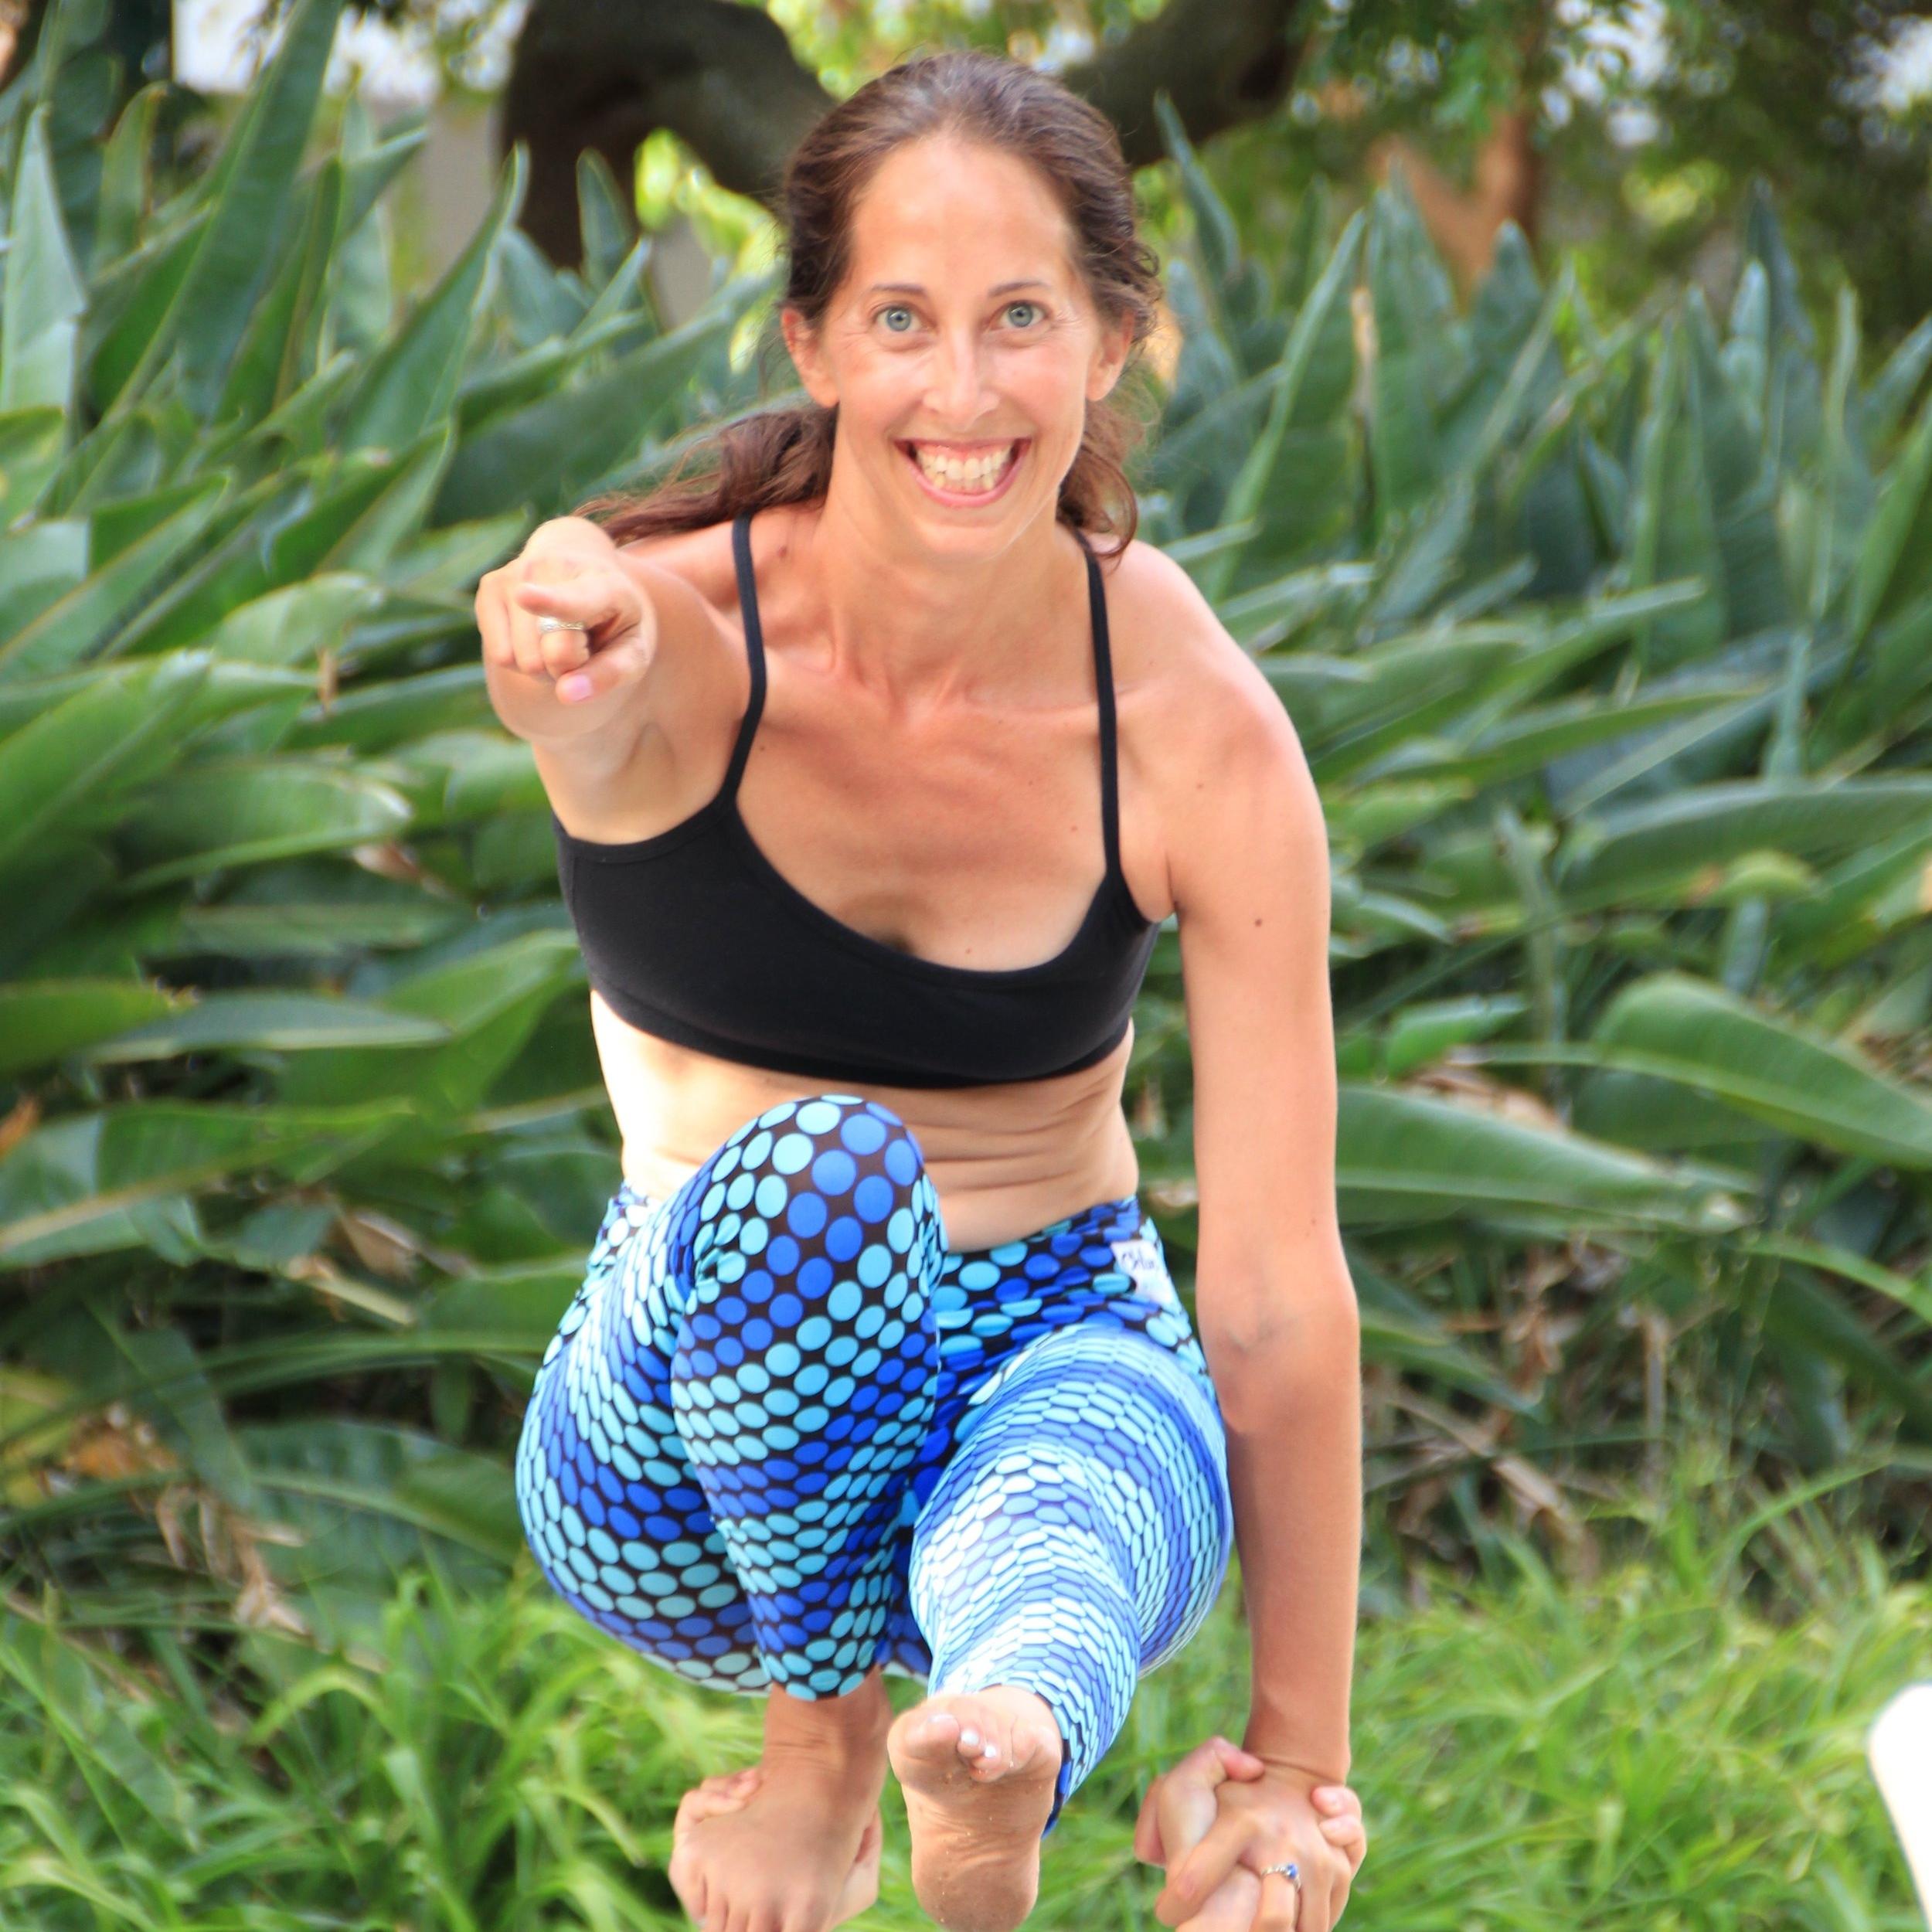 Cape Town - Acro Yoga, VinyasaWebsite | Email | Facebook | Instagram | LinkedIn079 334 8268